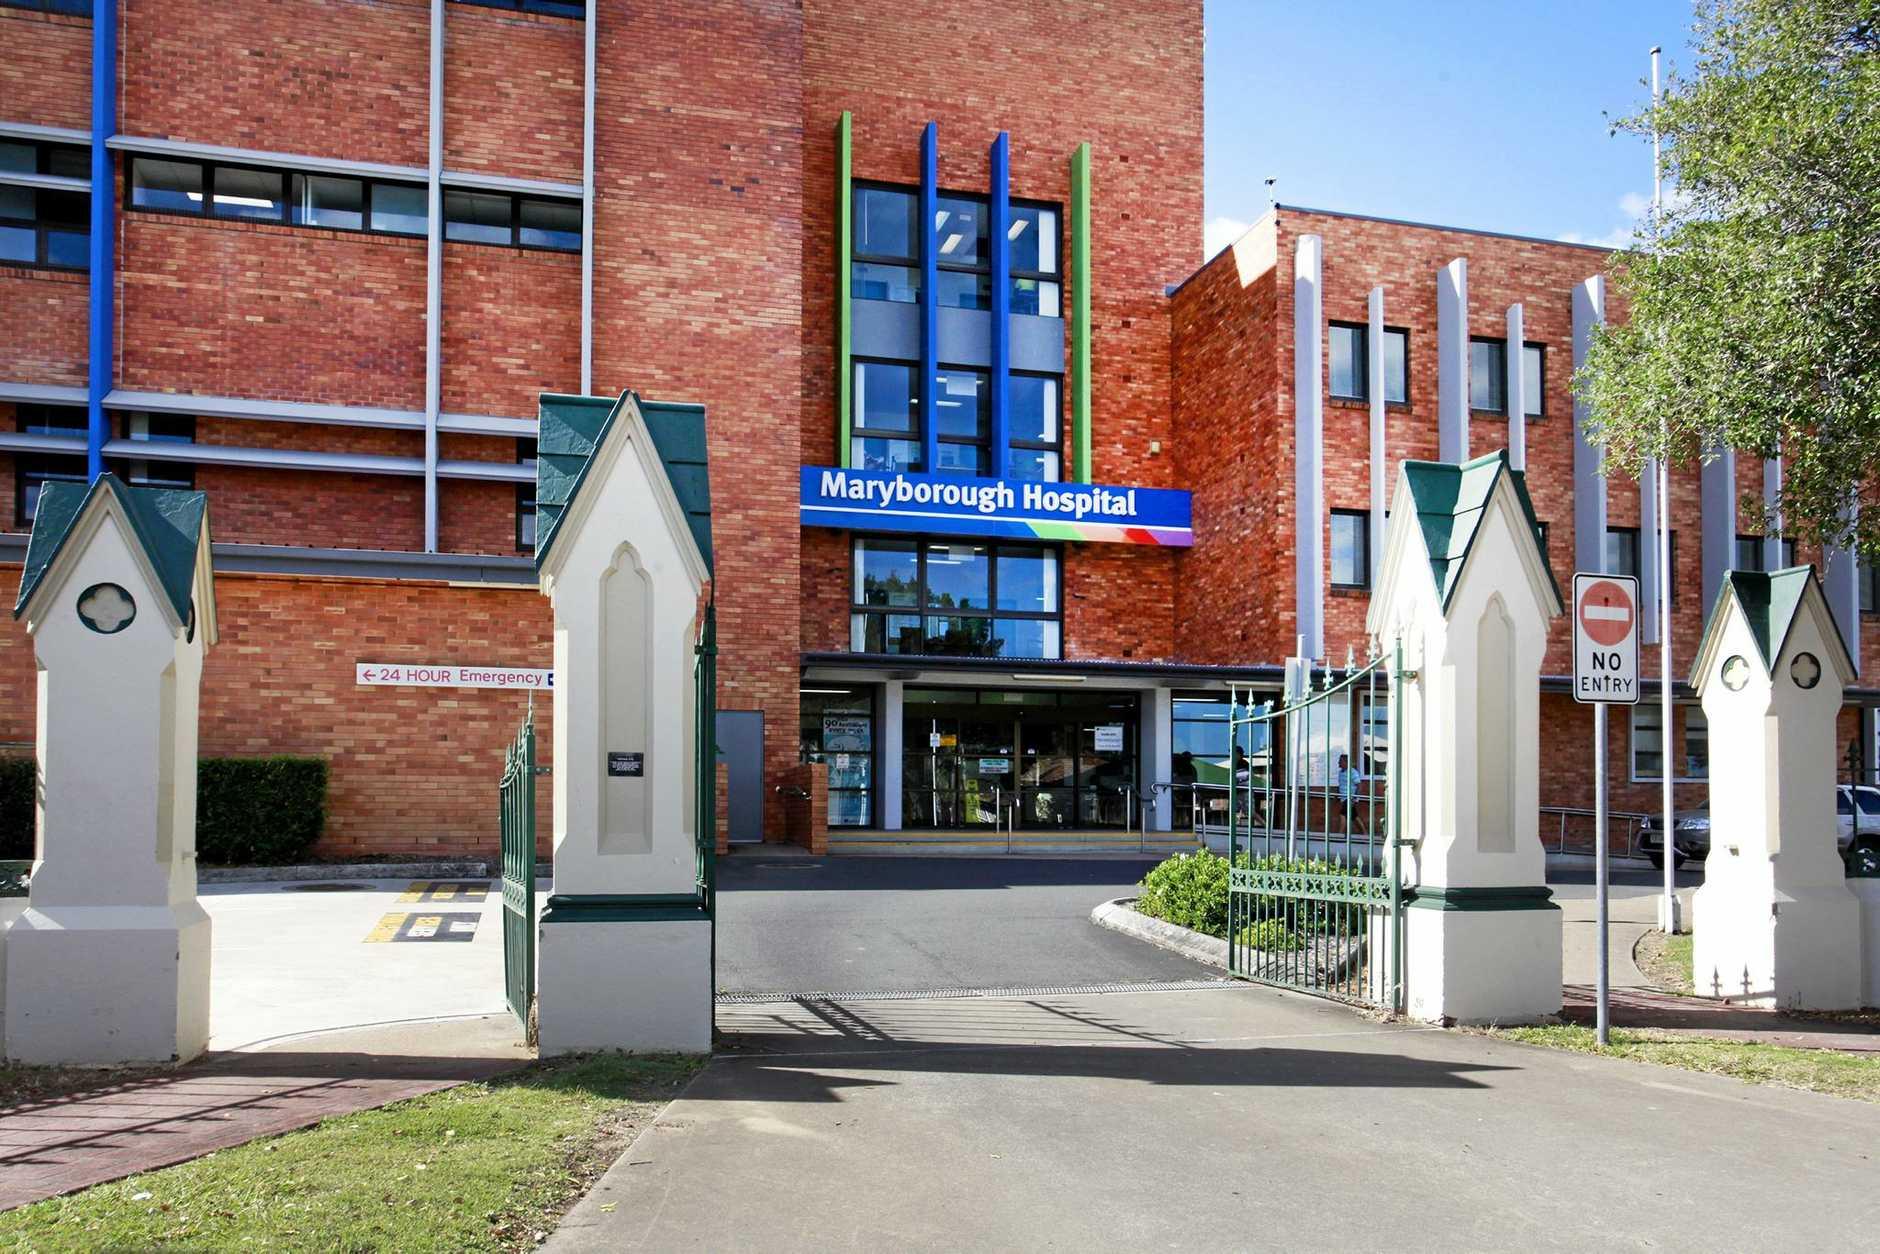 Maryborough Hospital.